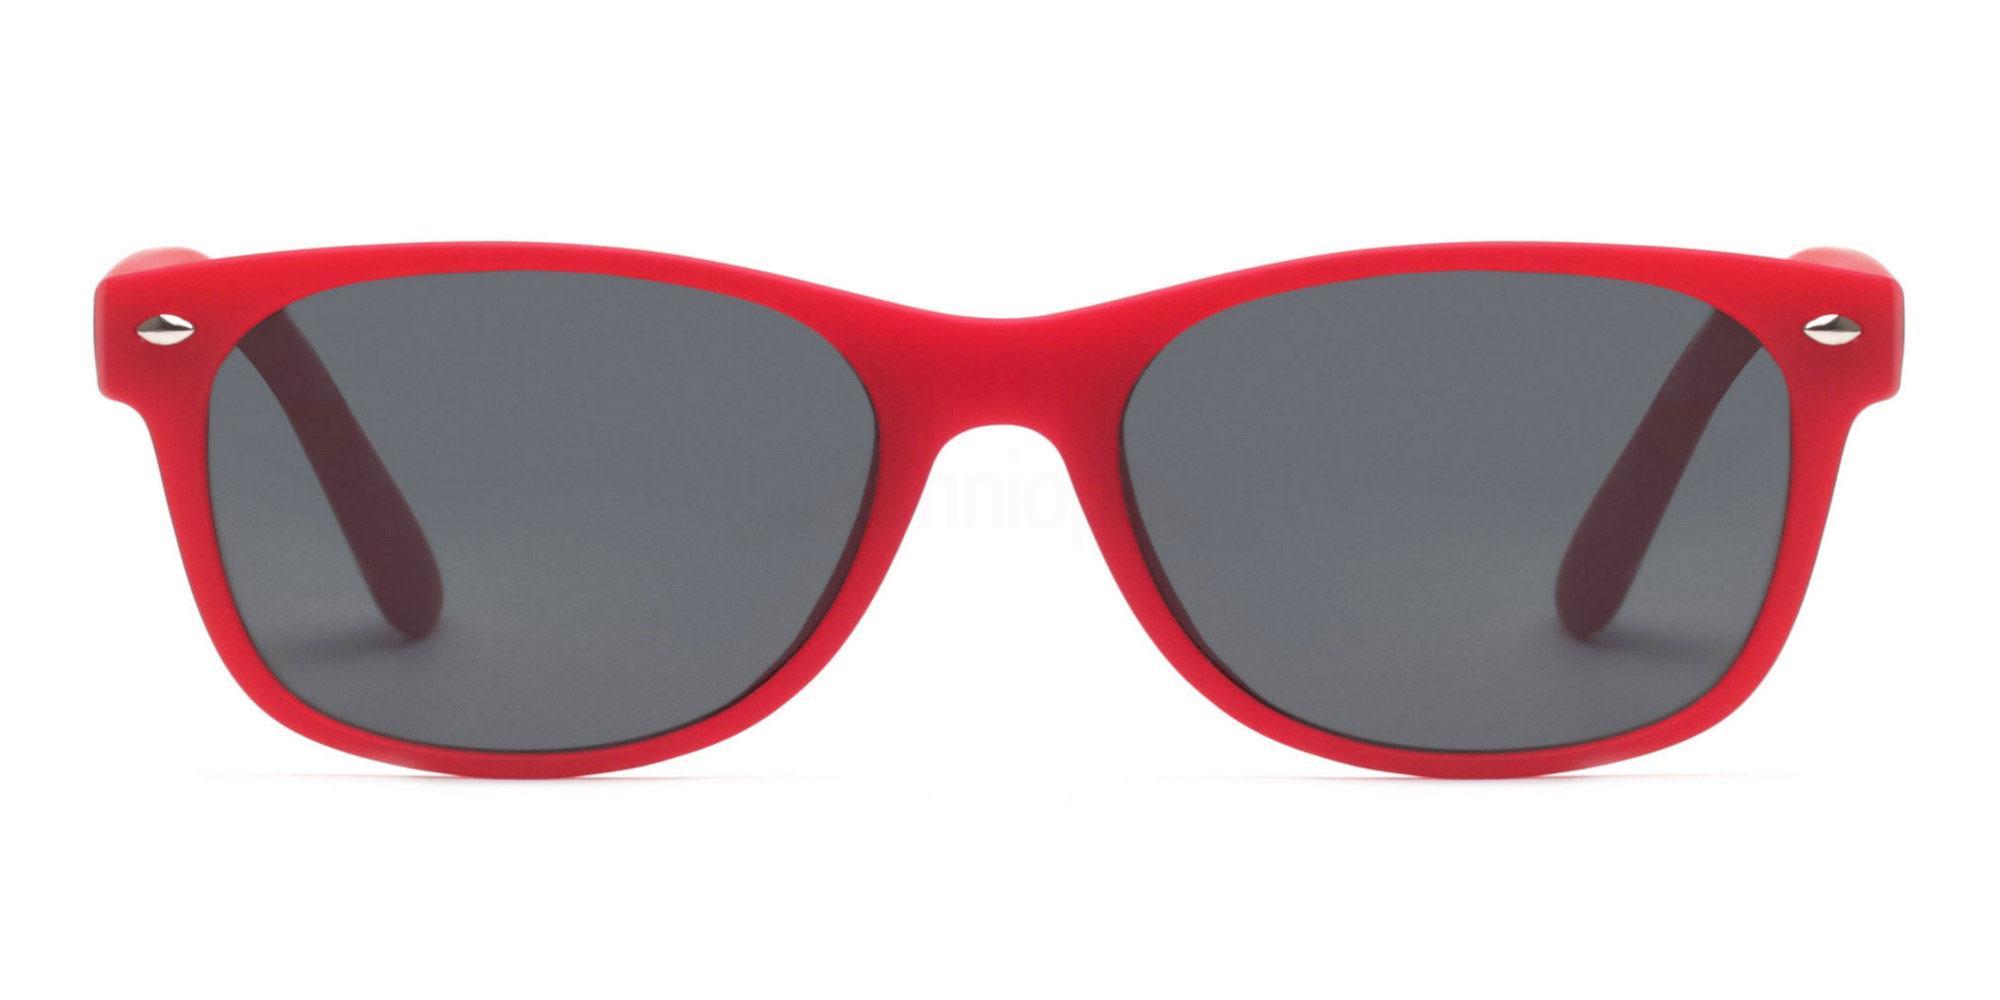 Red S8122 - Red (Sunglasses) Sunglasses, Savannah